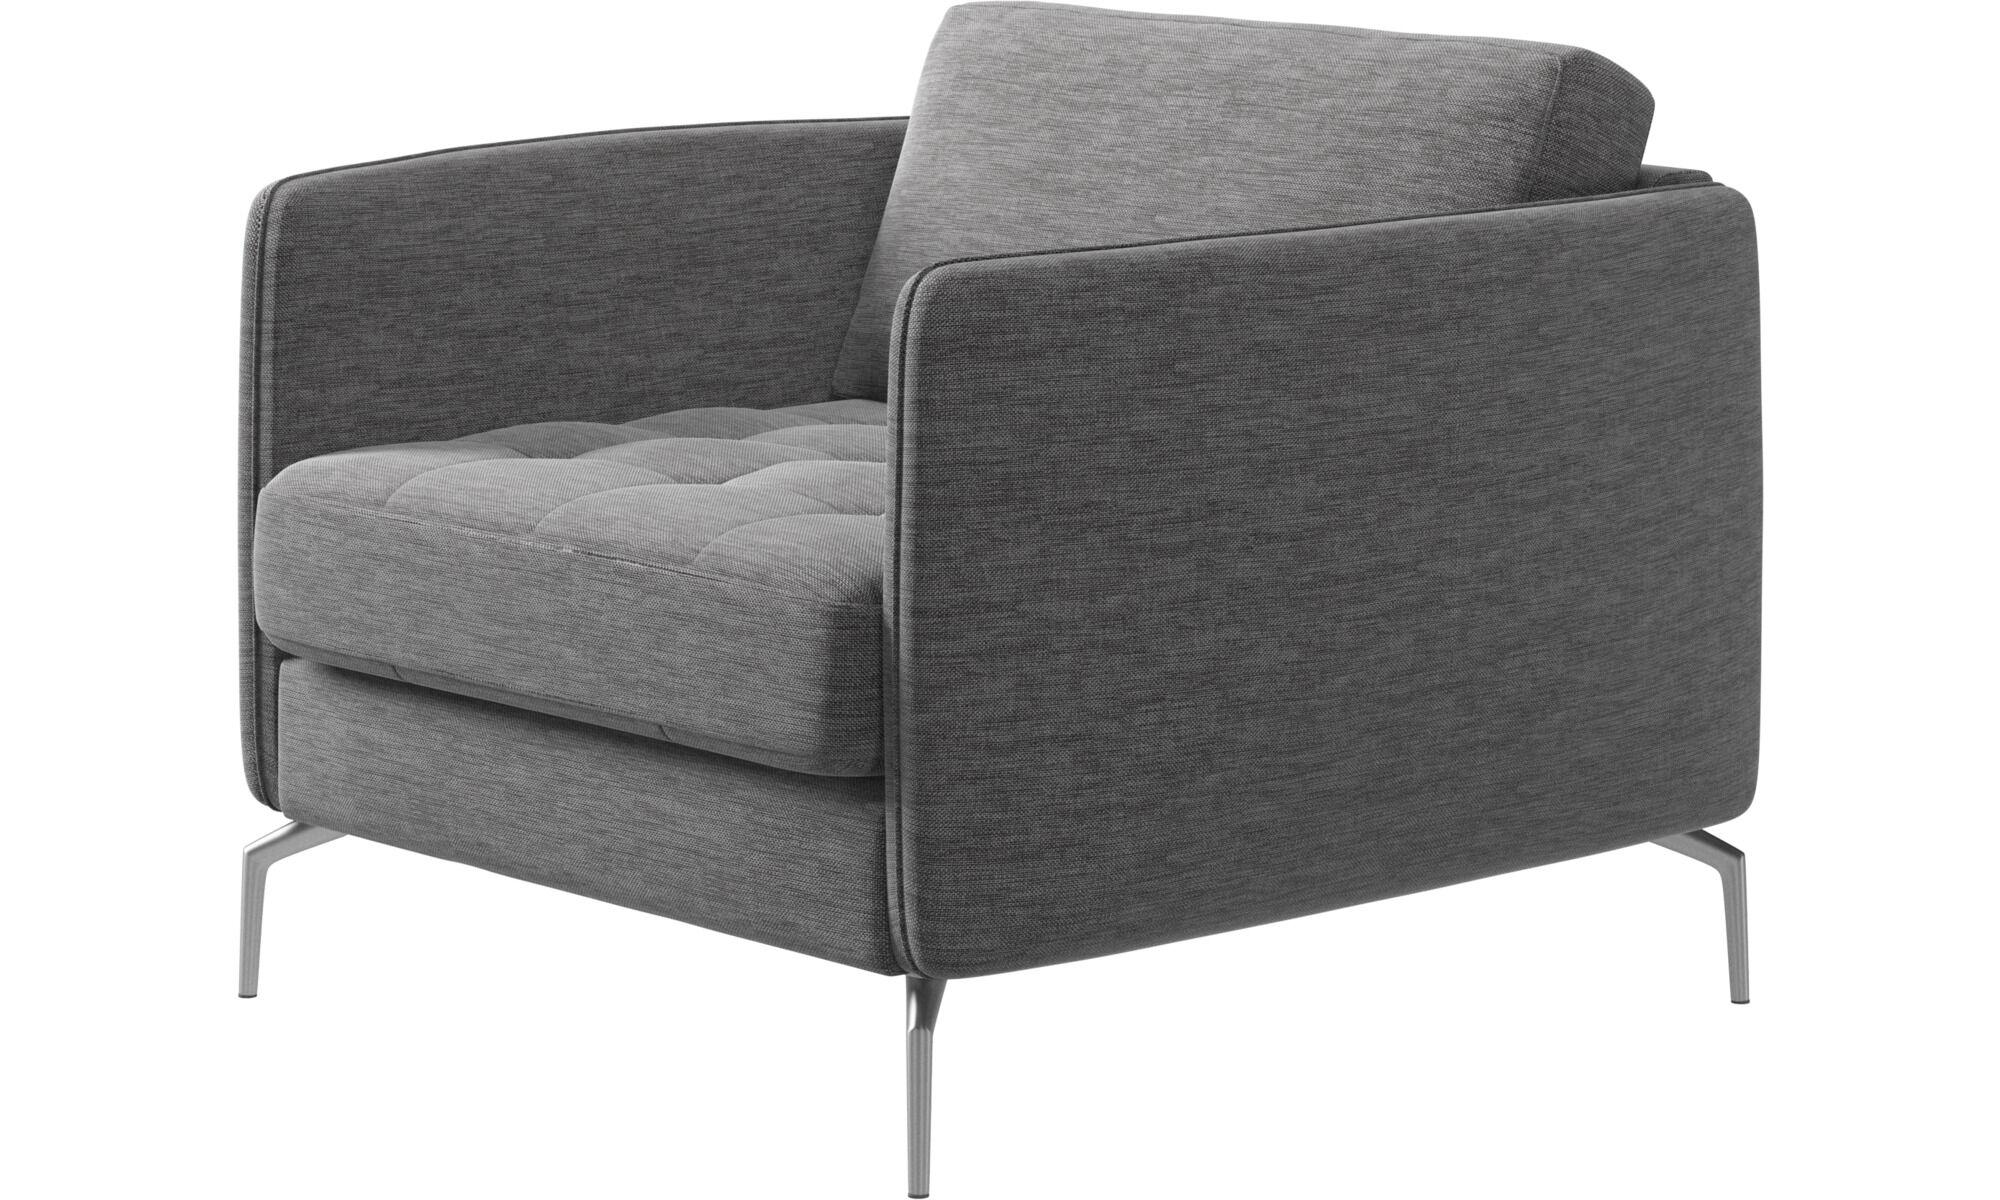 armchairs osaka chair tufted seat grey fabric